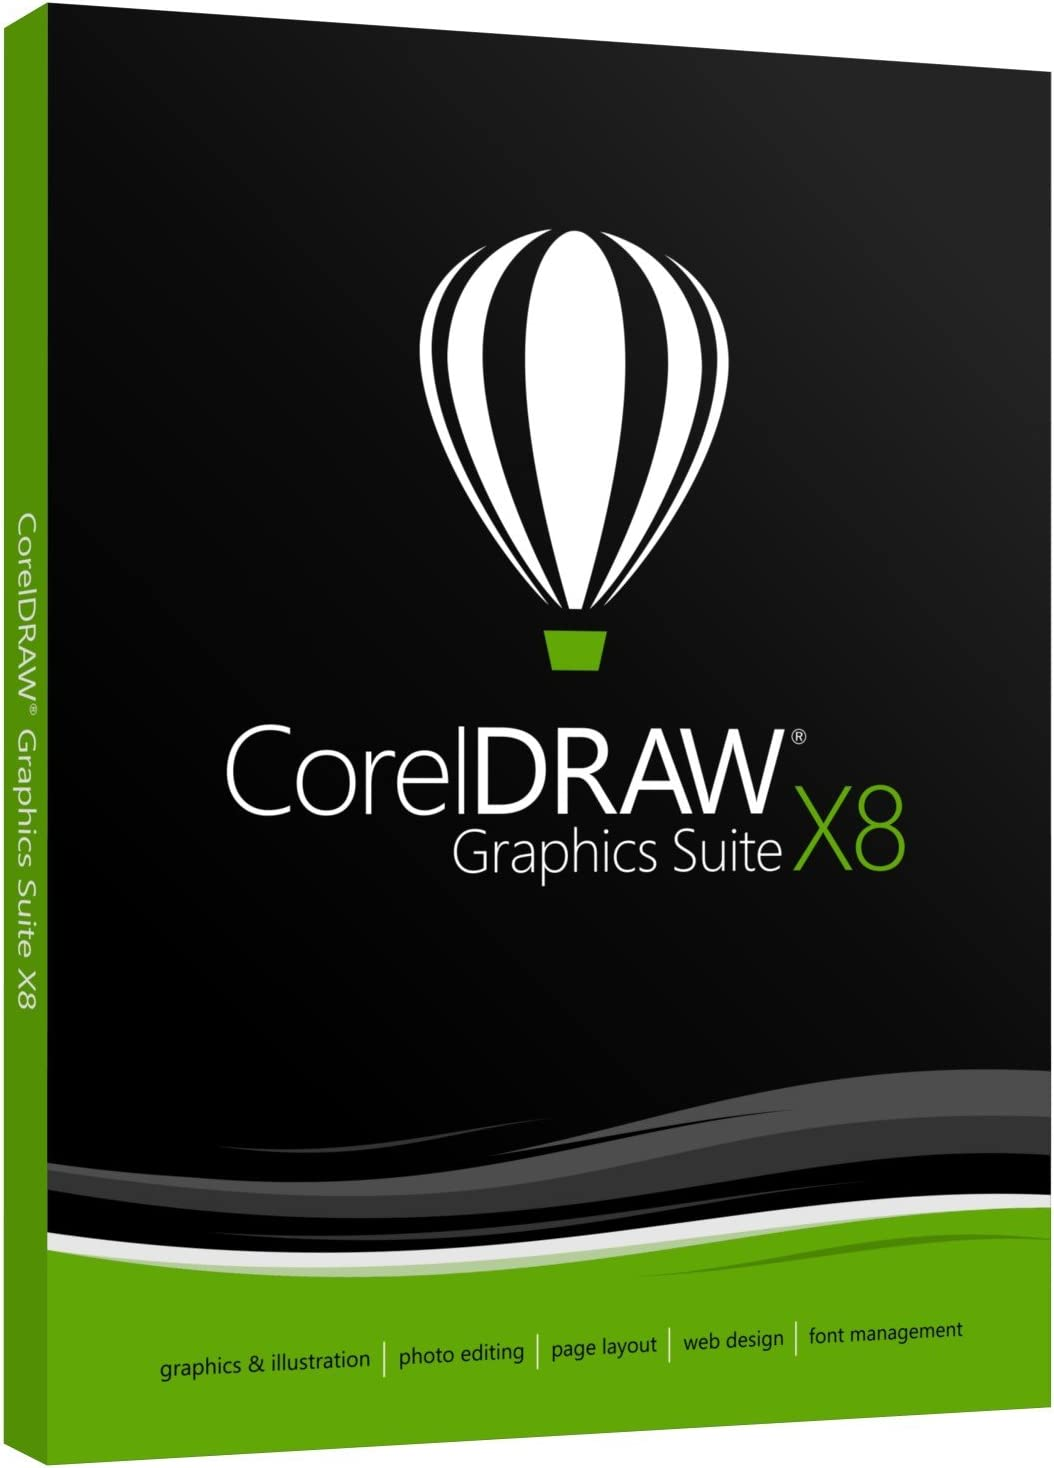 CorelDRAW Graphics Suite X8 Academic (Old Version)